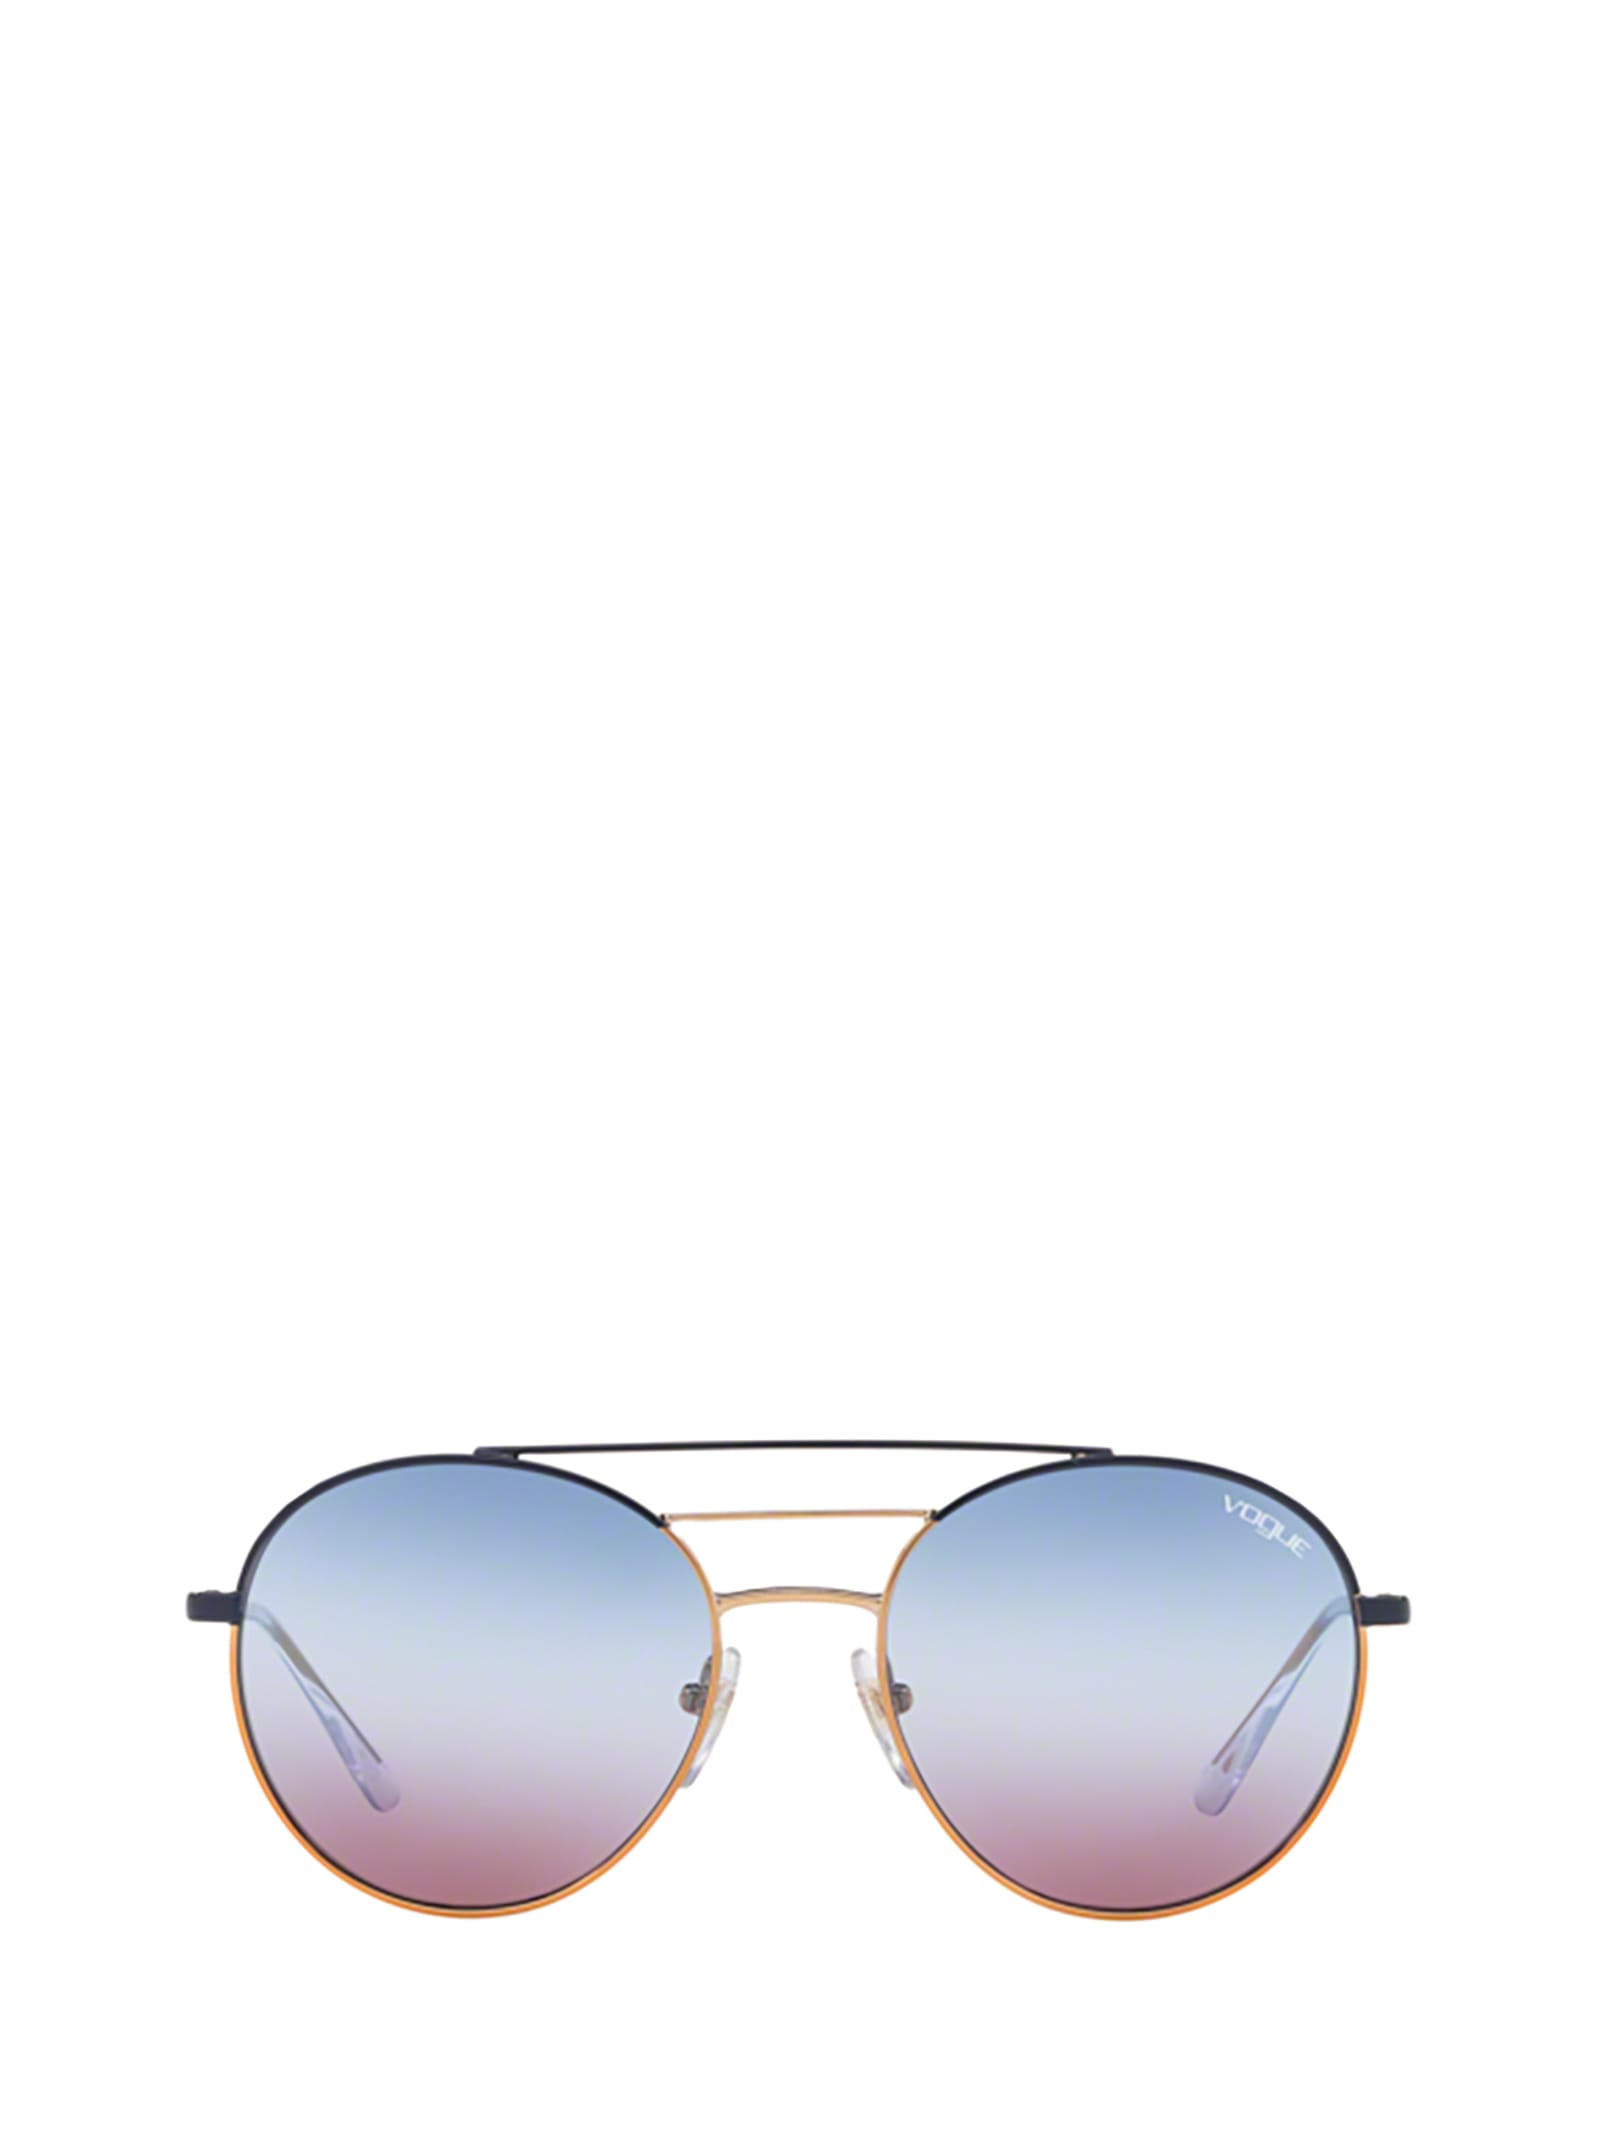 Vogue Eyewear Vogue Vo4117s 50750k Sunglasses